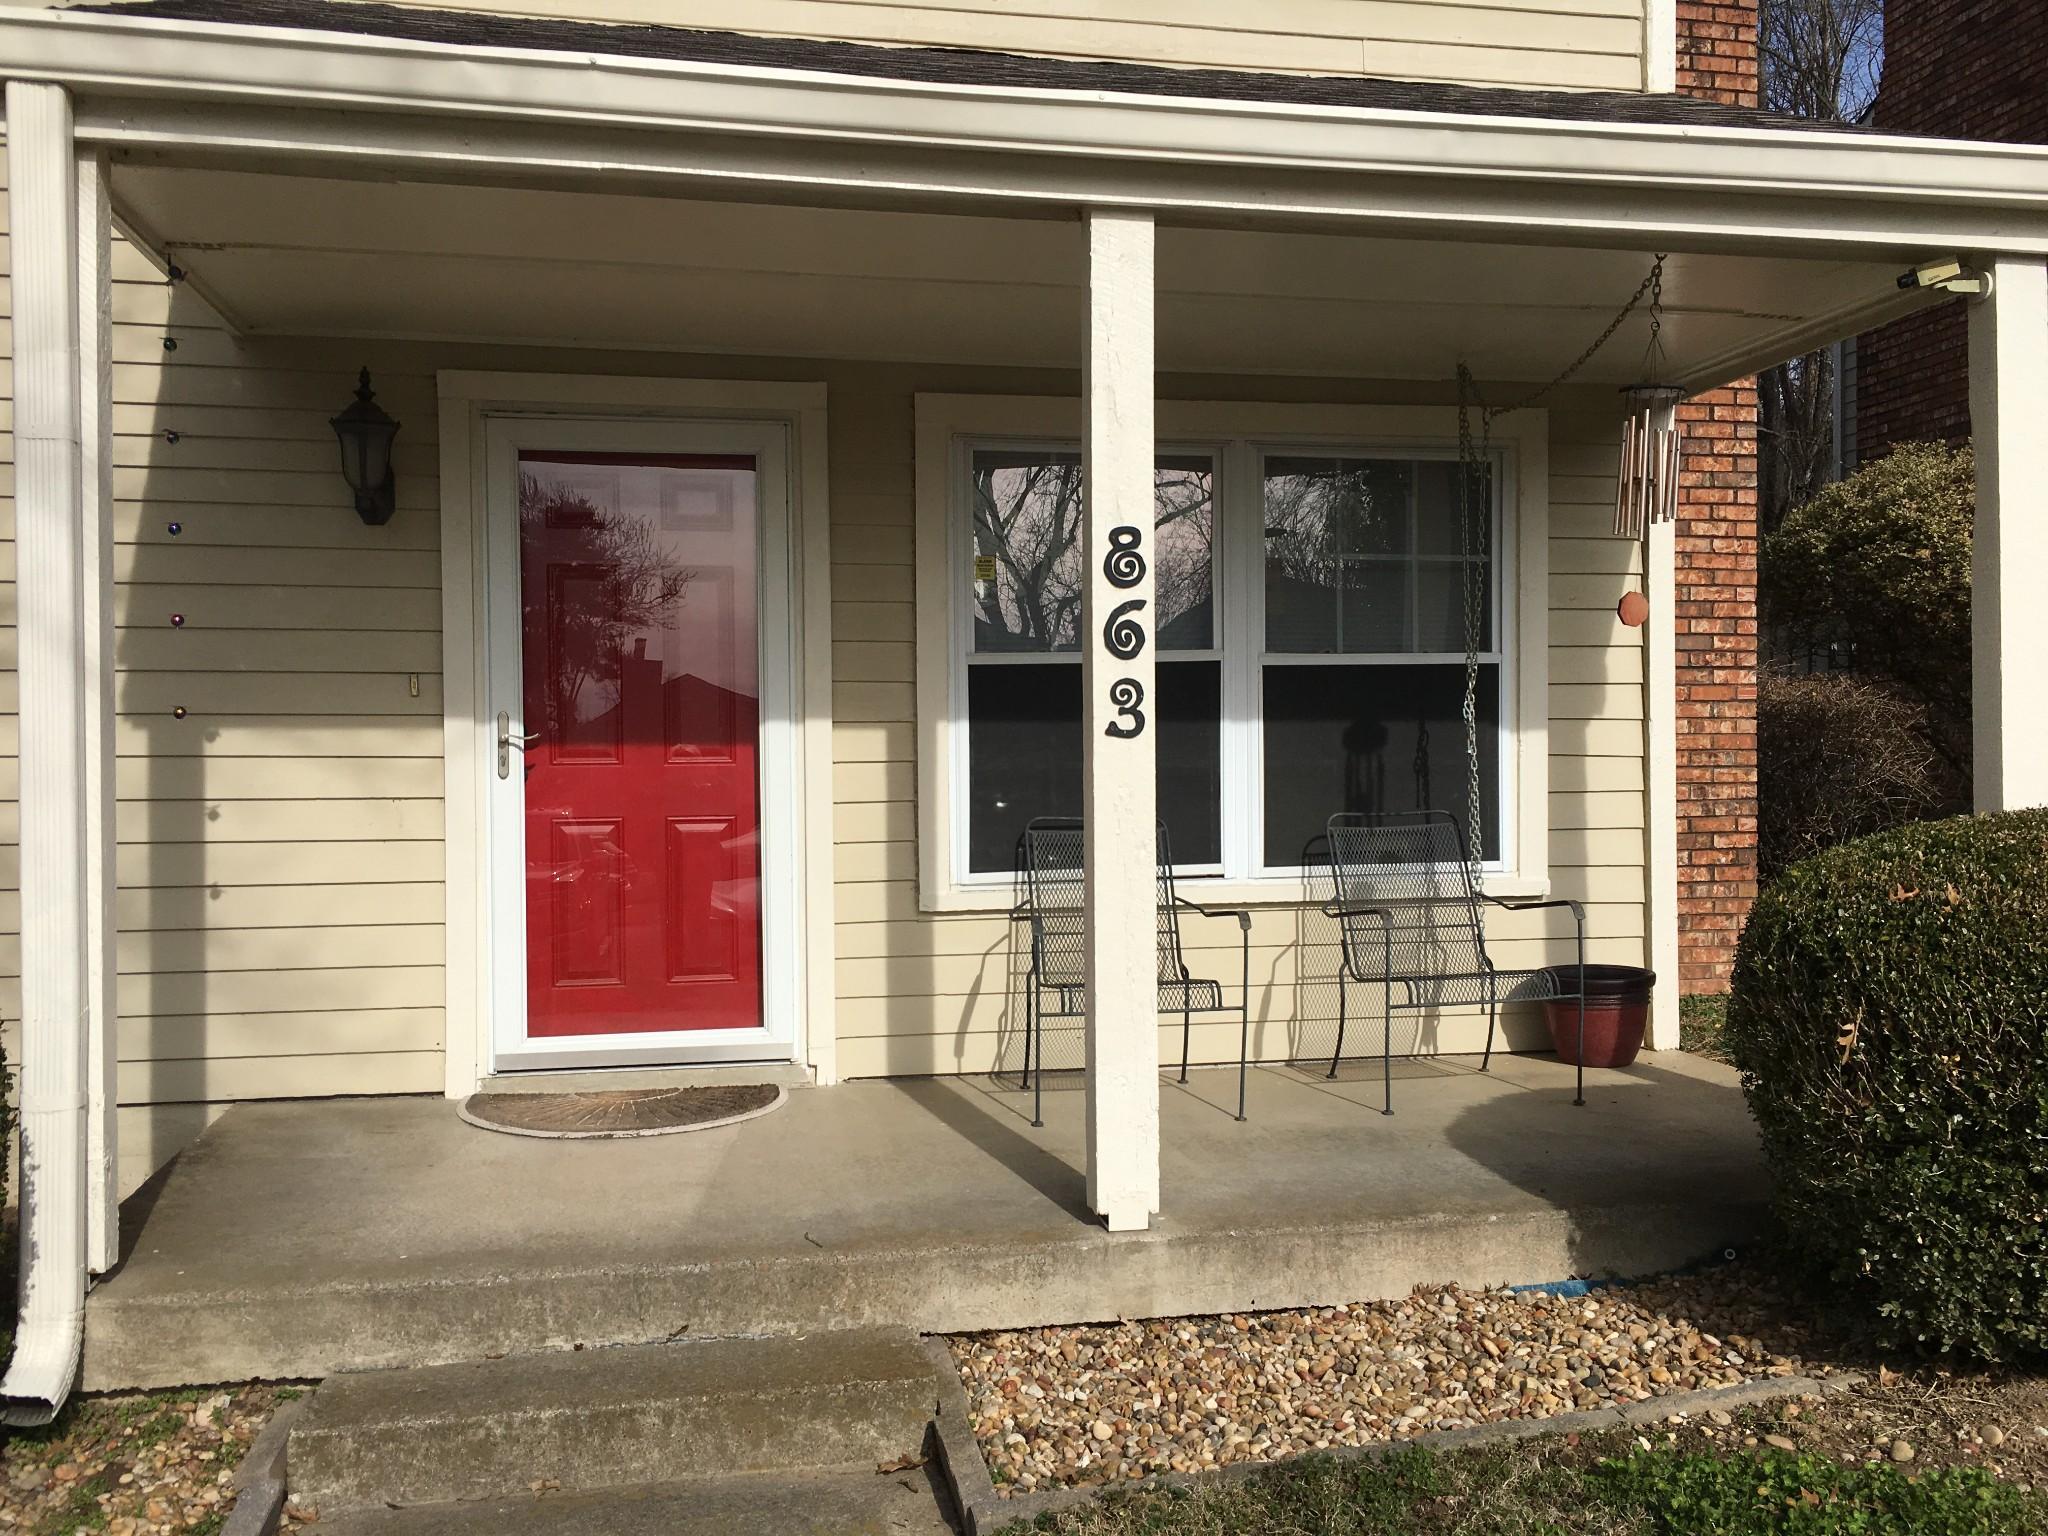 863 Longhunter Ct, Nashville, TN 37217 - Nashville, TN real estate listing